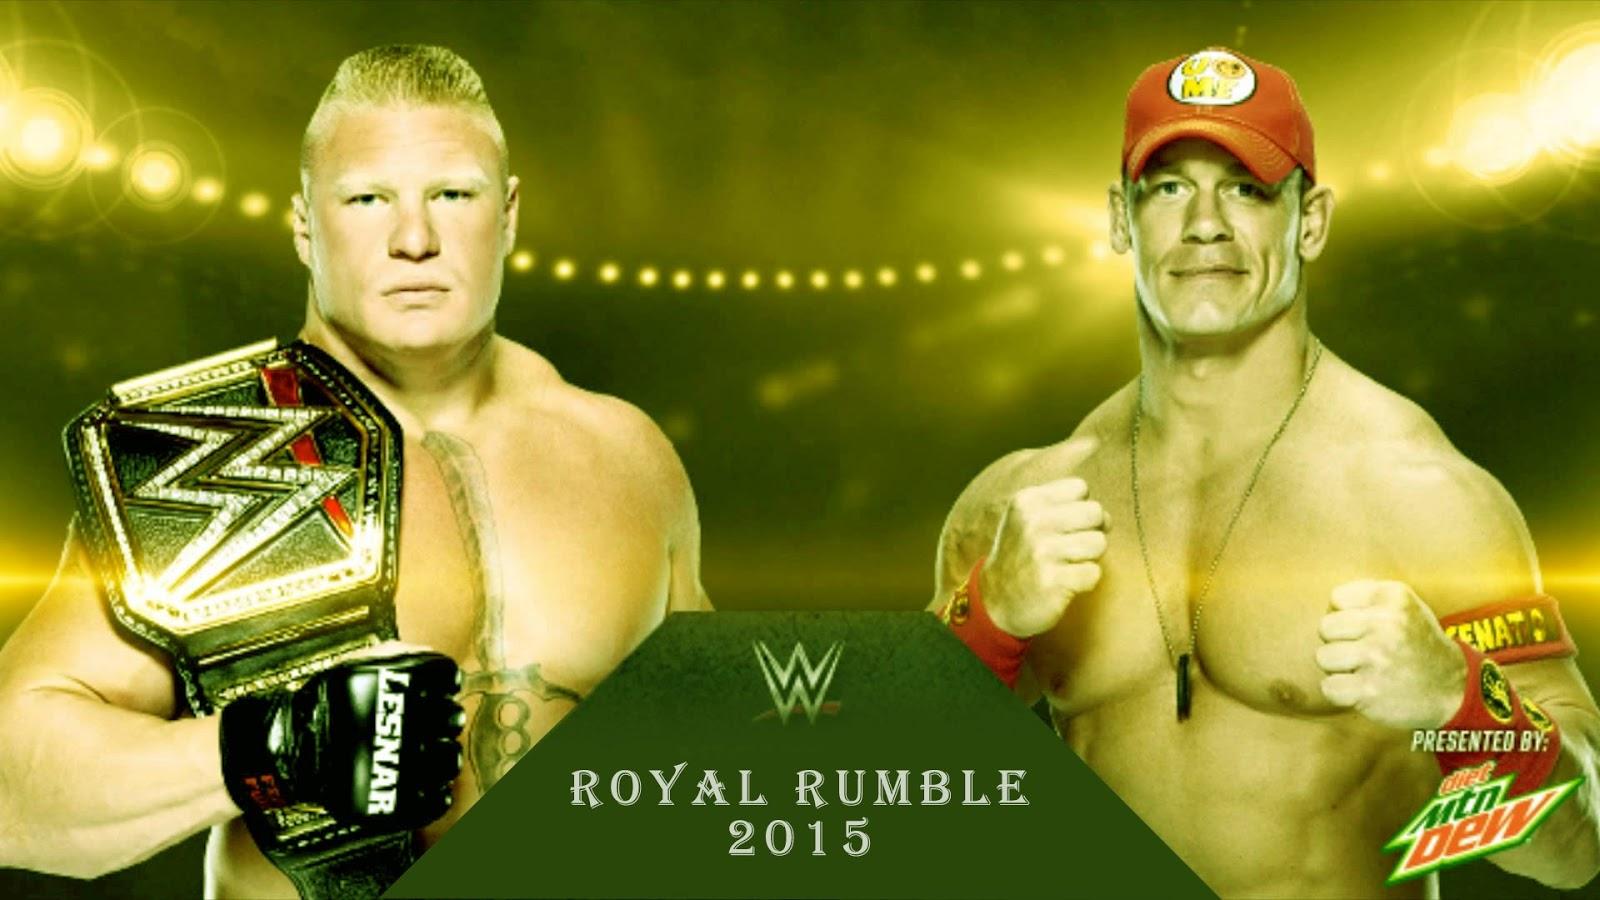 John Cena Royal Rumble 2015 Wallpaper HD